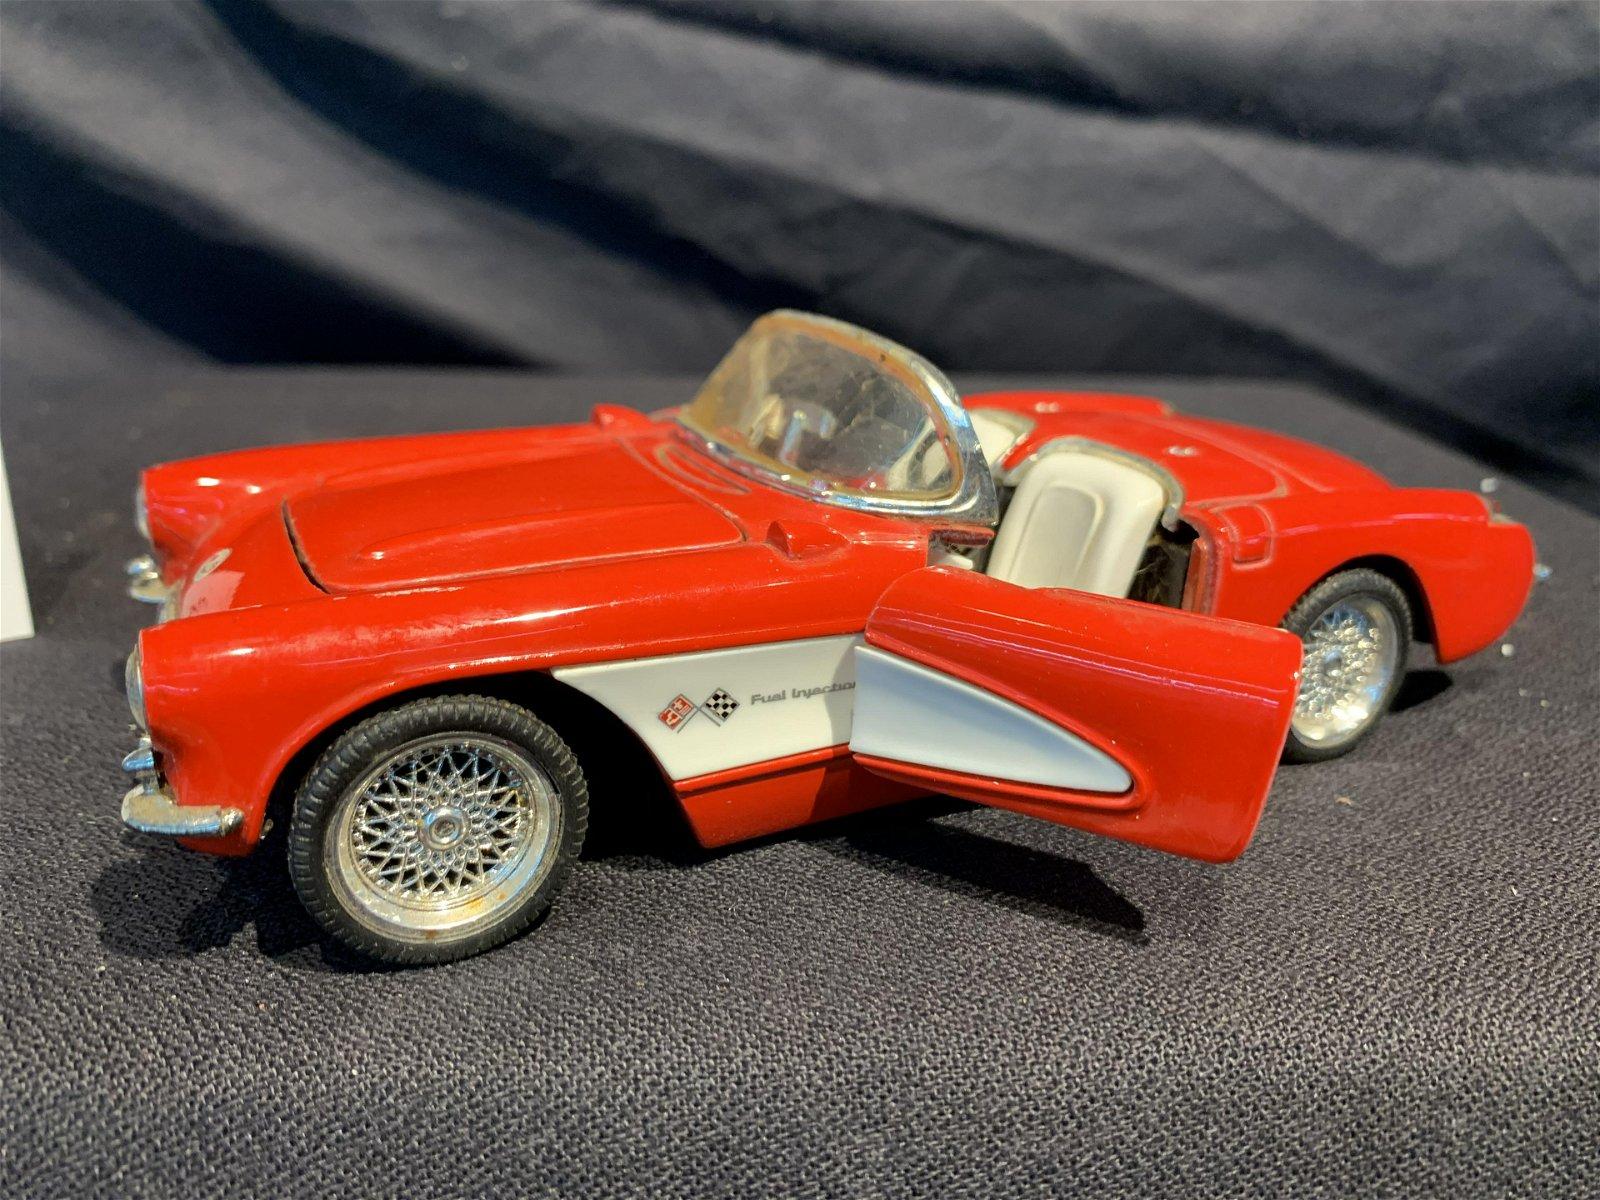 1957 Corvette convertible die cast metal car